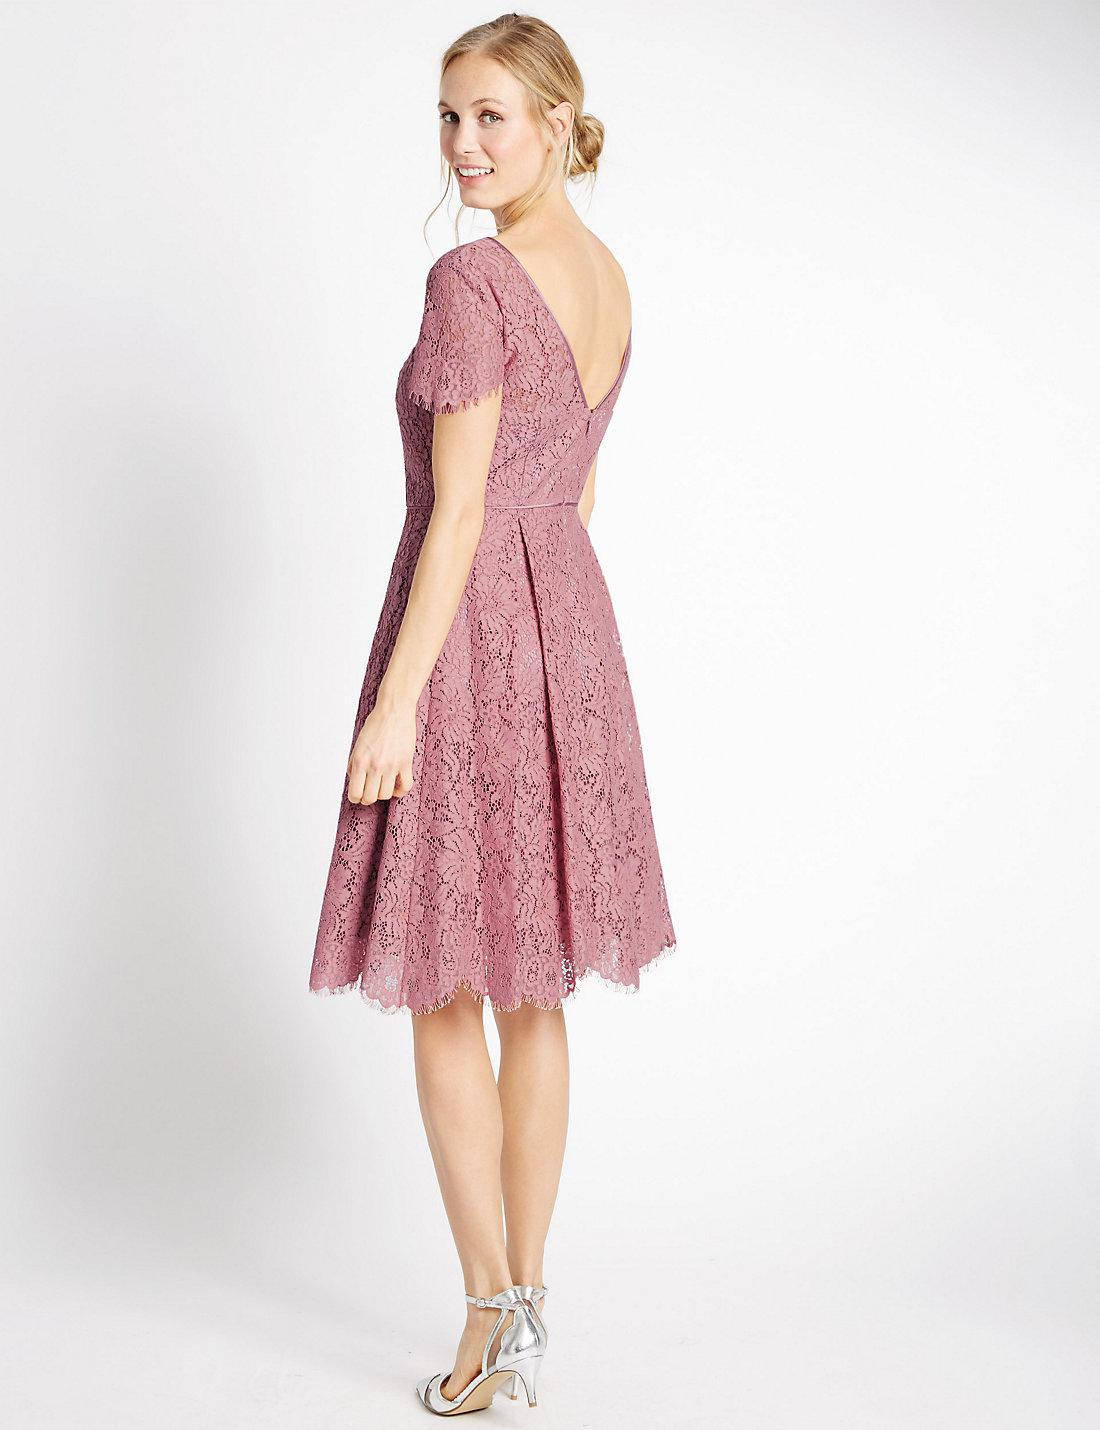 Increíble Marks & Spencer Vestidos De Dama Motivo - Ideas de Estilos ...